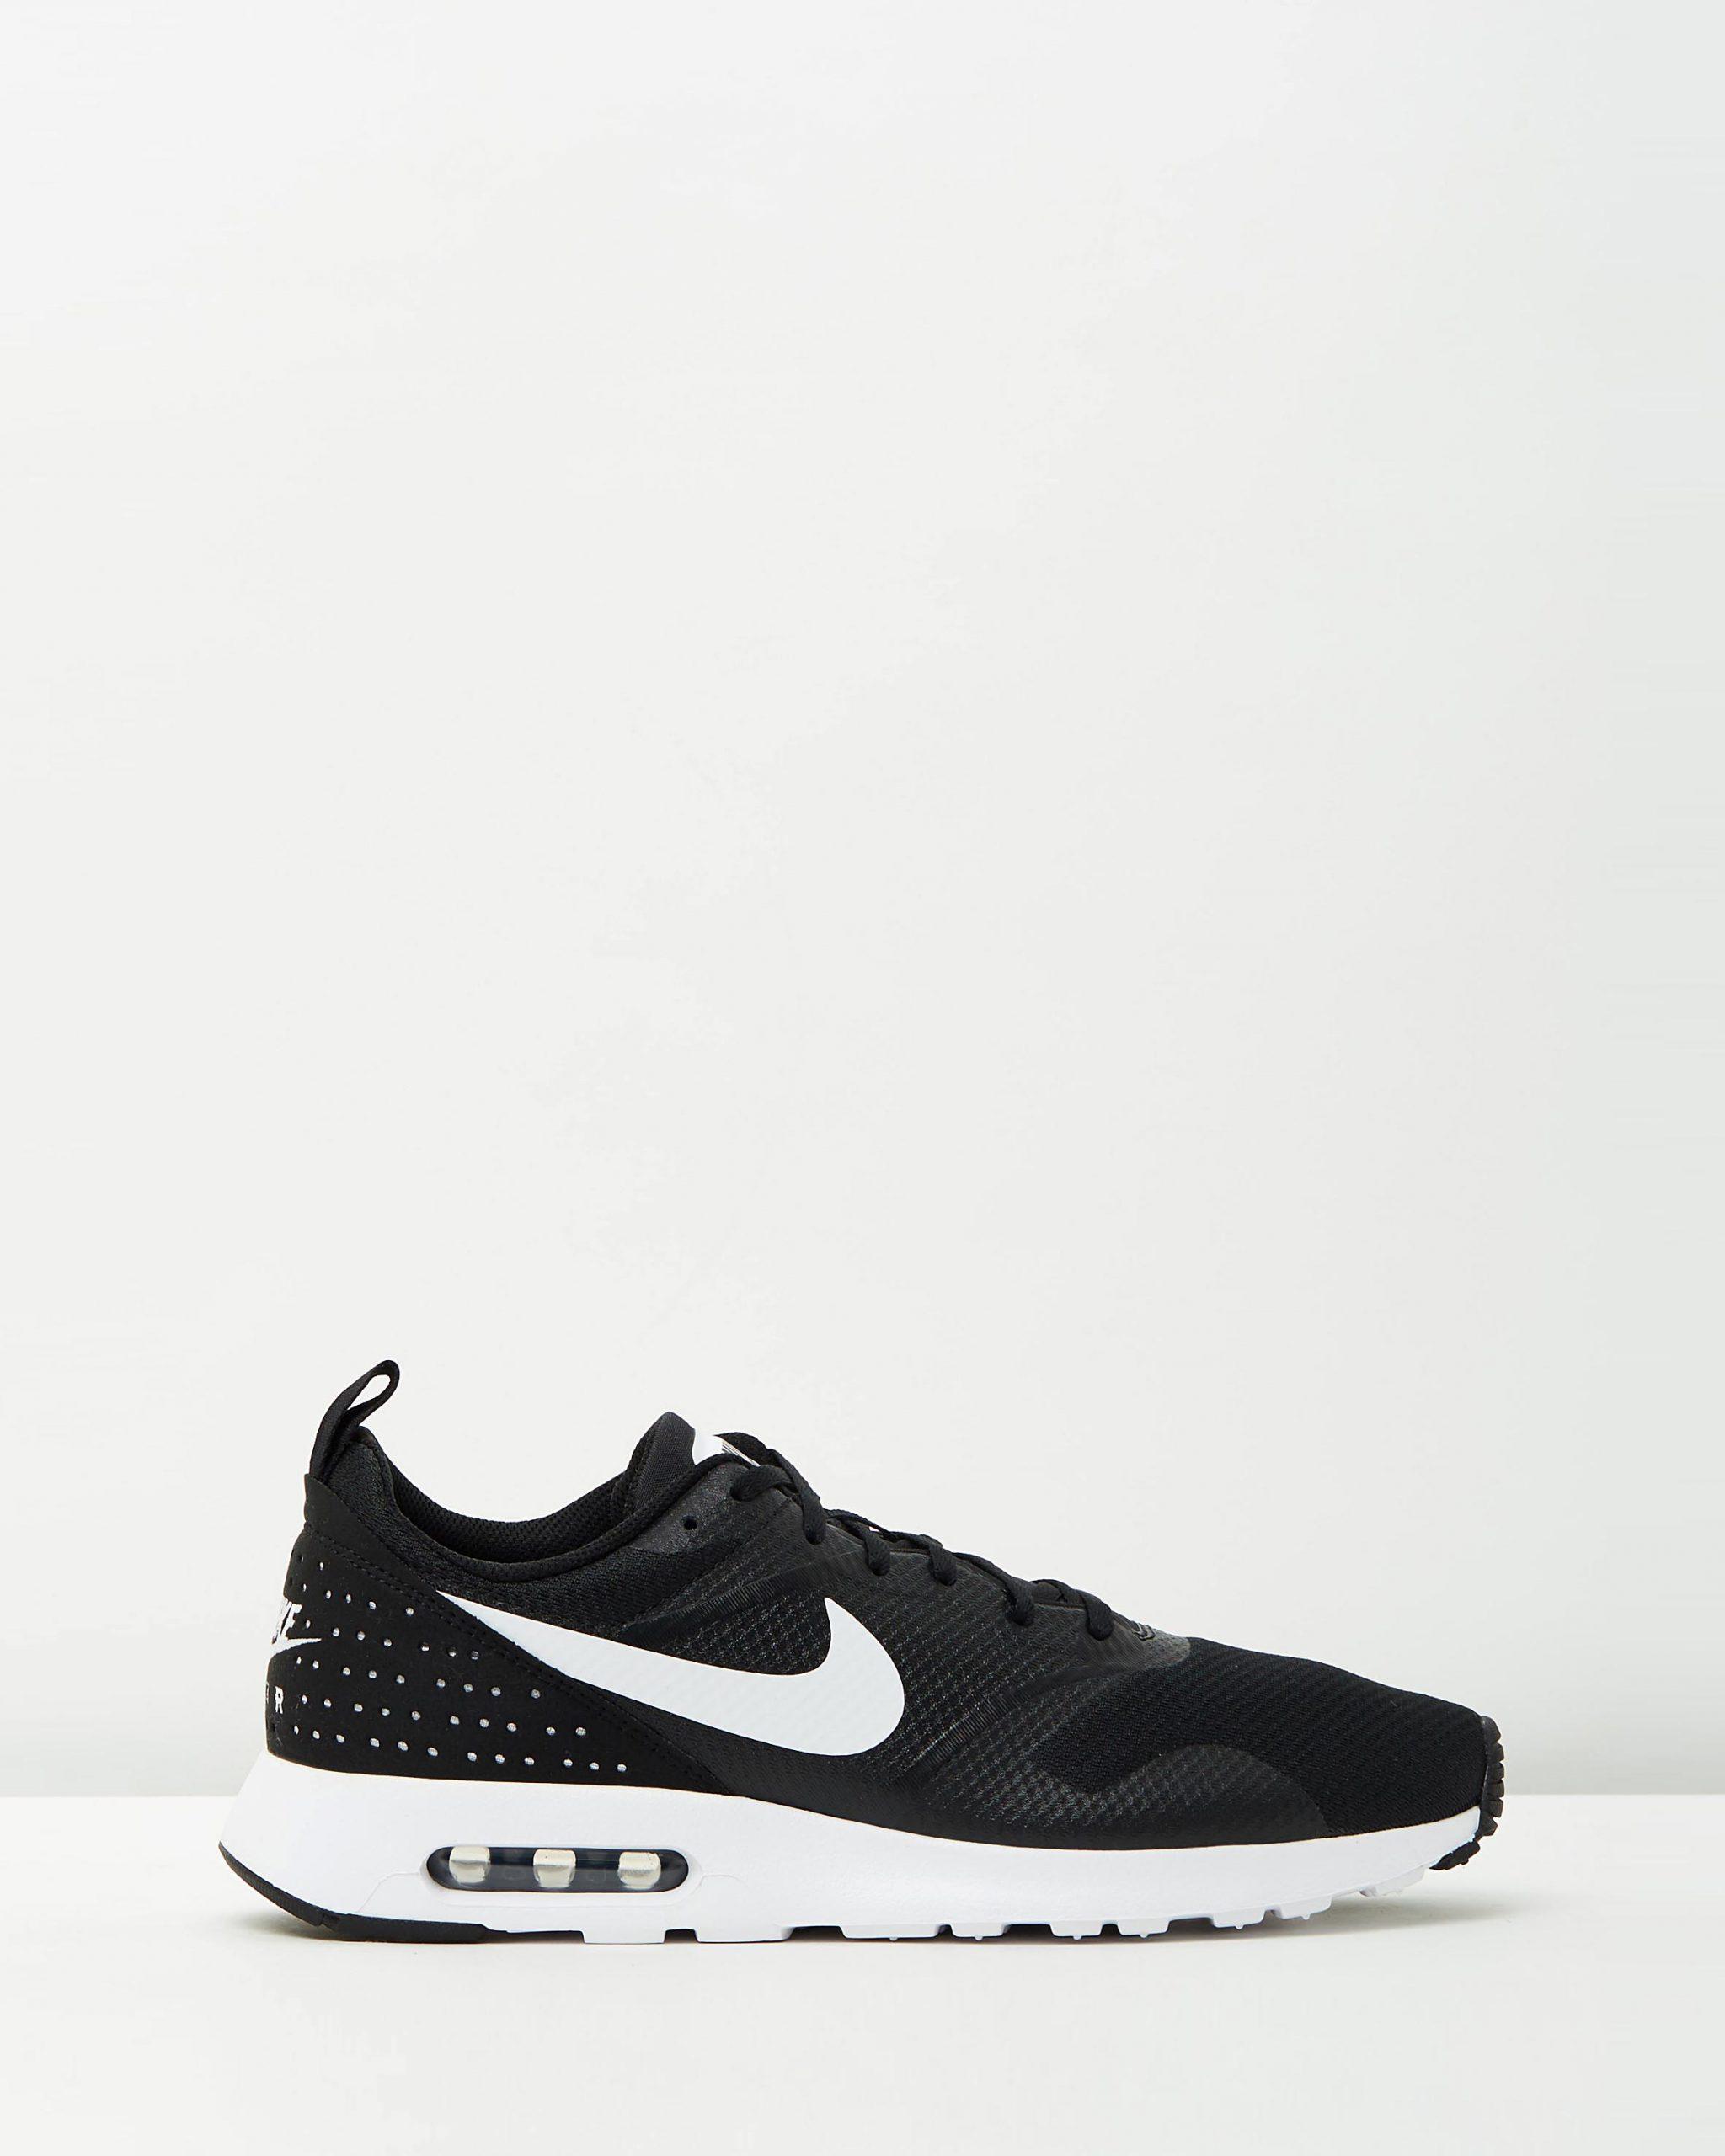 Nike Men's Air Max Tavas Black & White